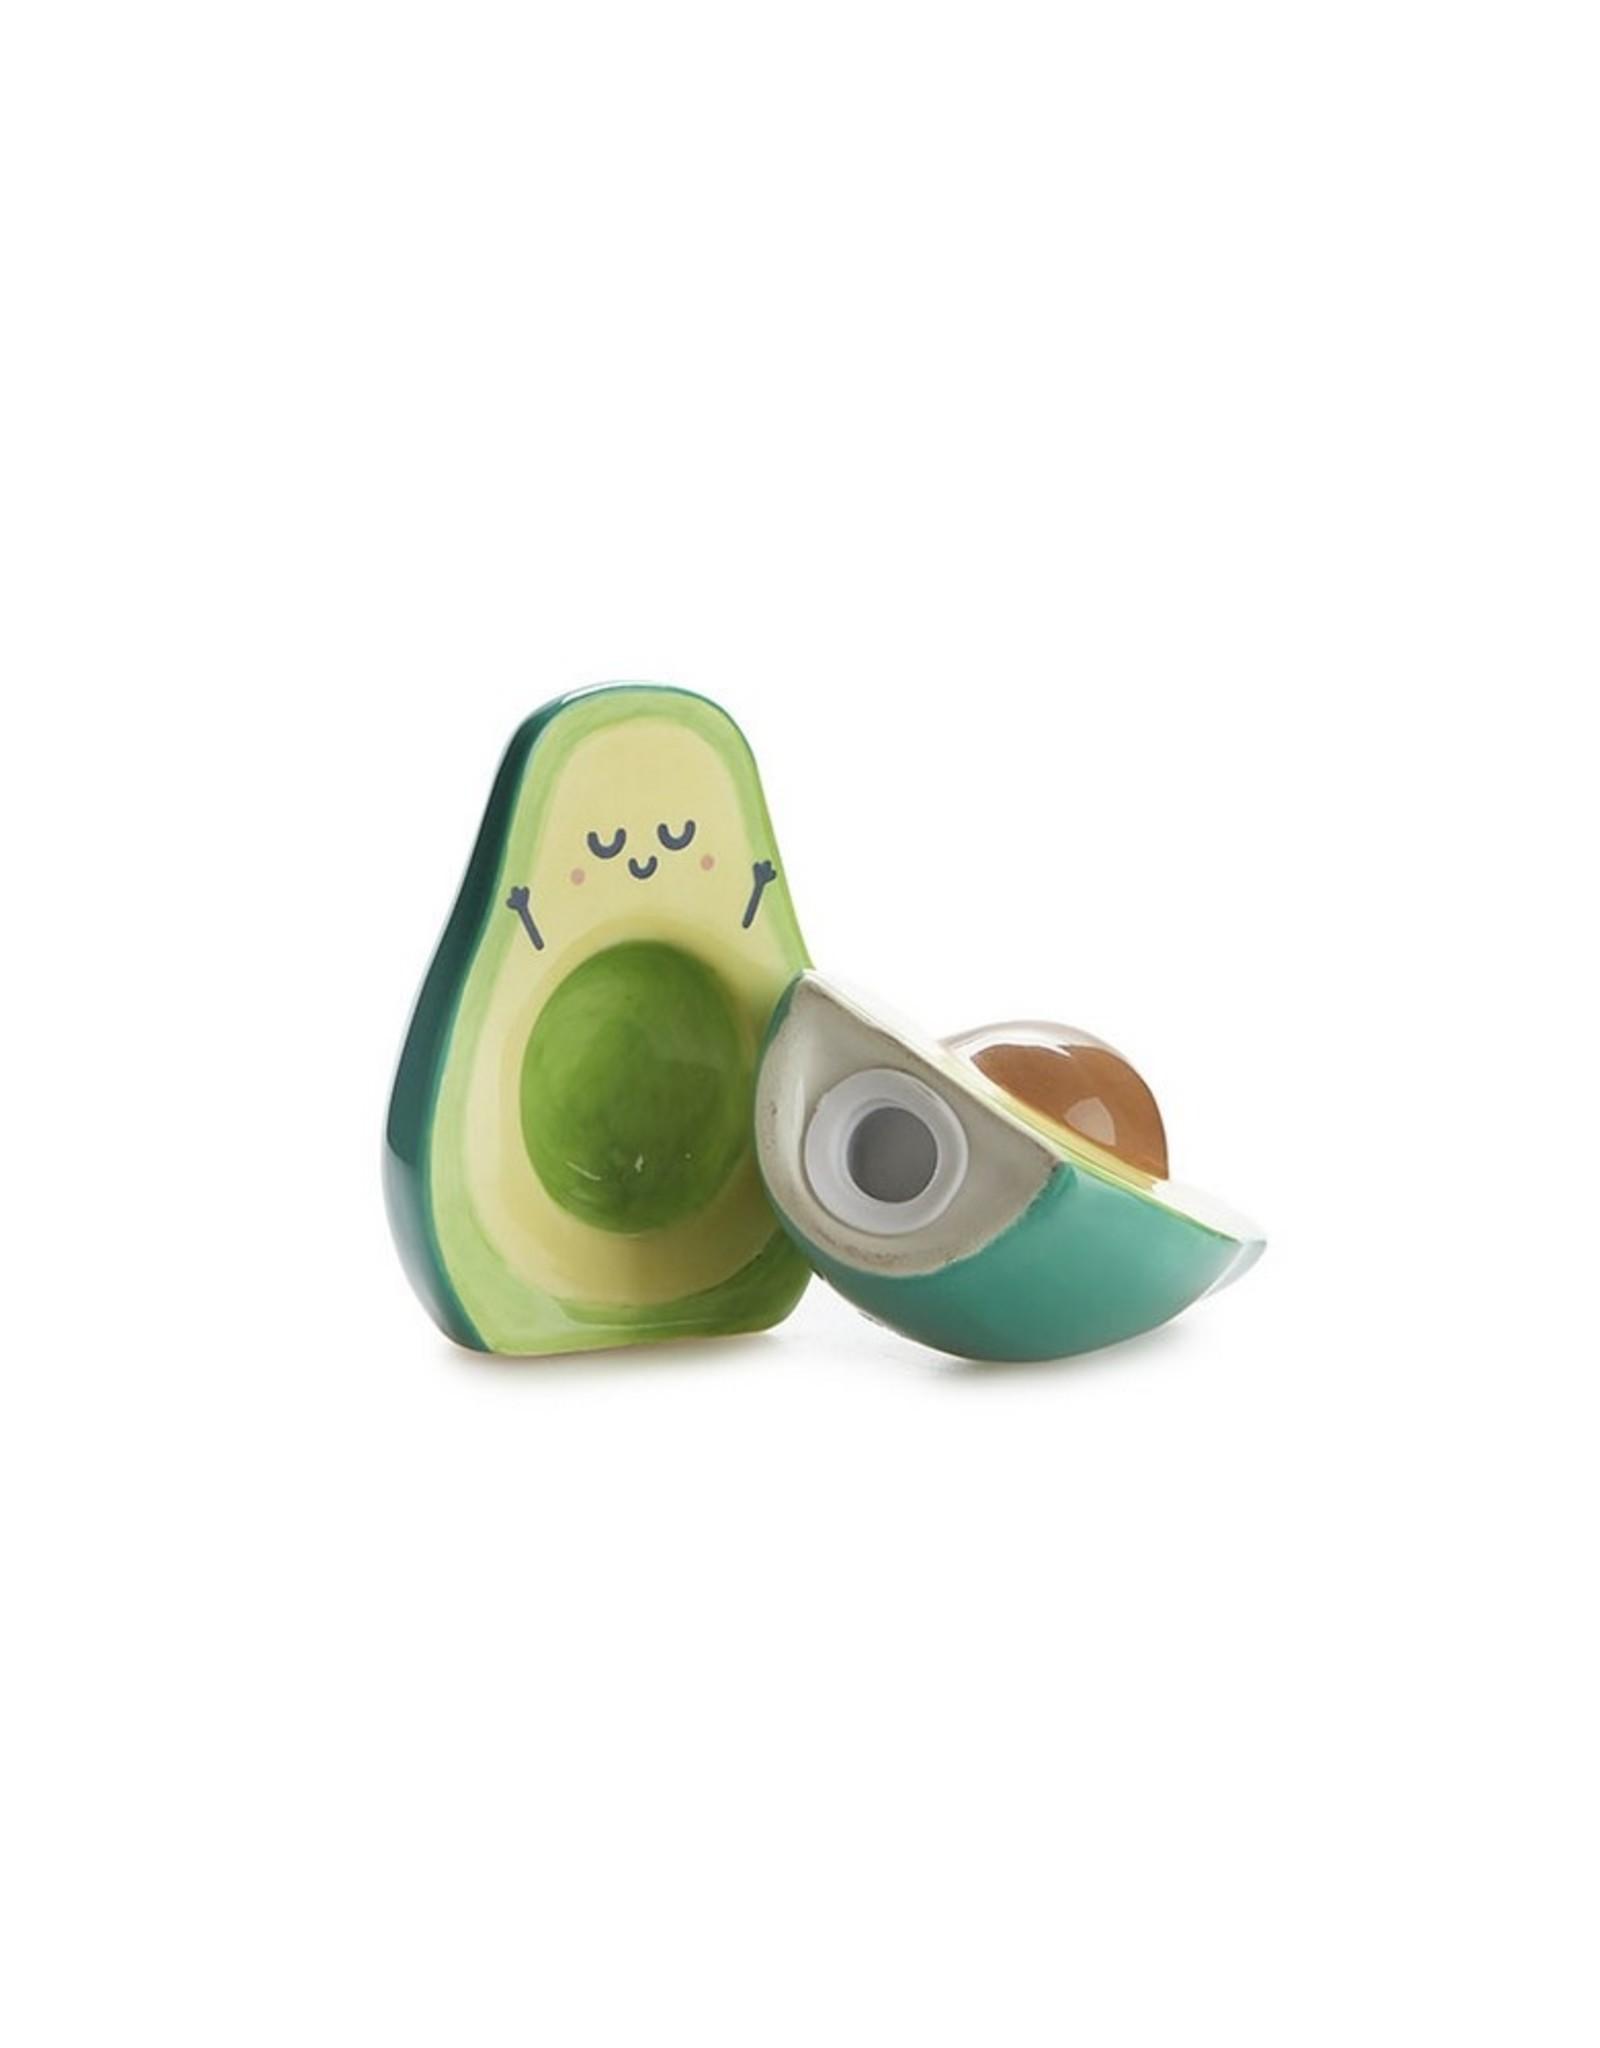 Balvi Peper- en zoutstel Avocado